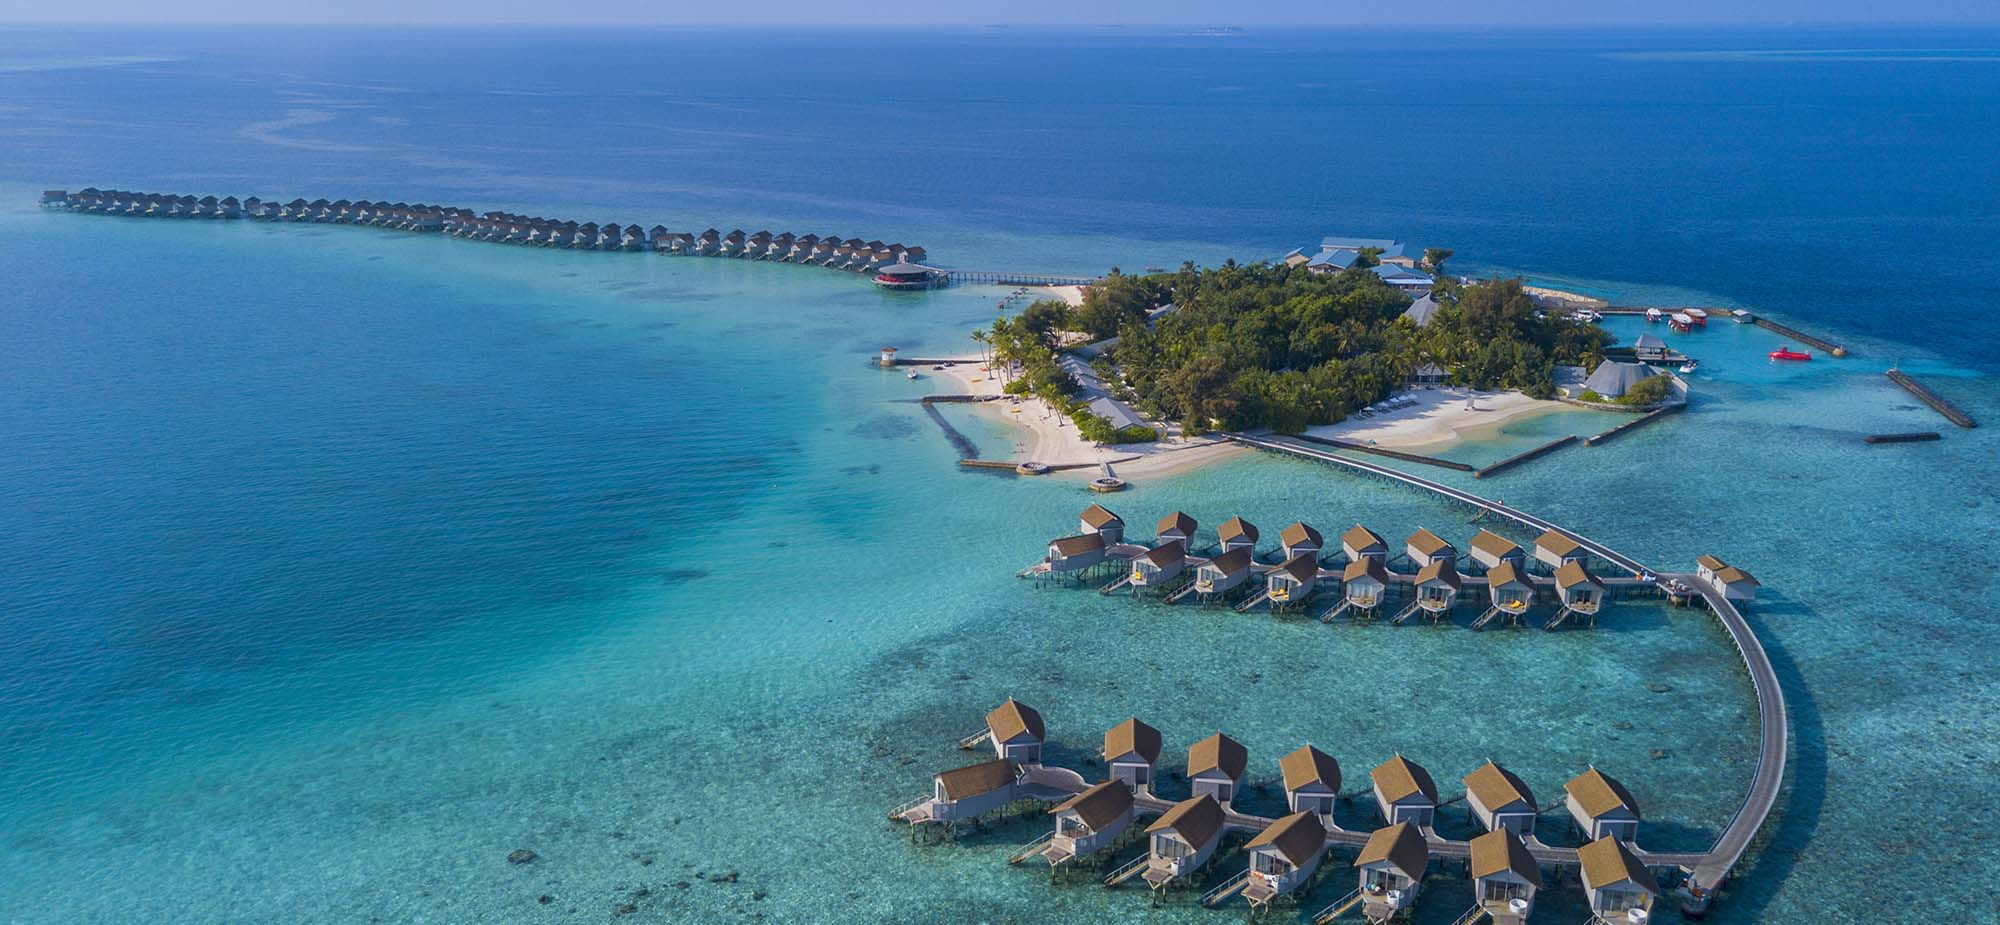 Centara-Ras-Fushi-Resort-Spa-Maldives-ivivu-1